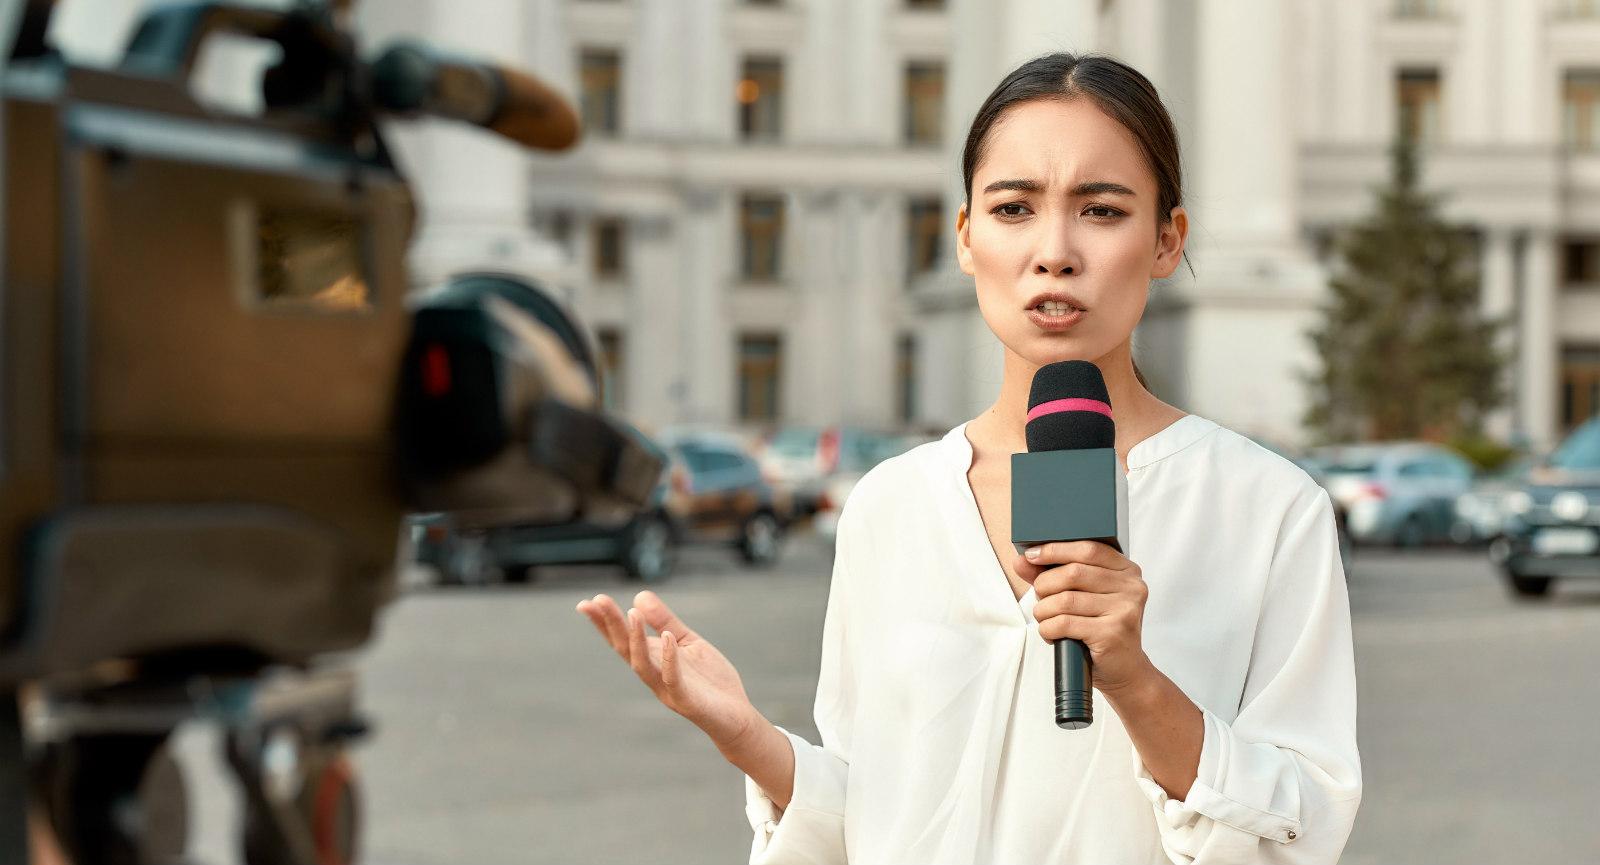 Femme journaliste média